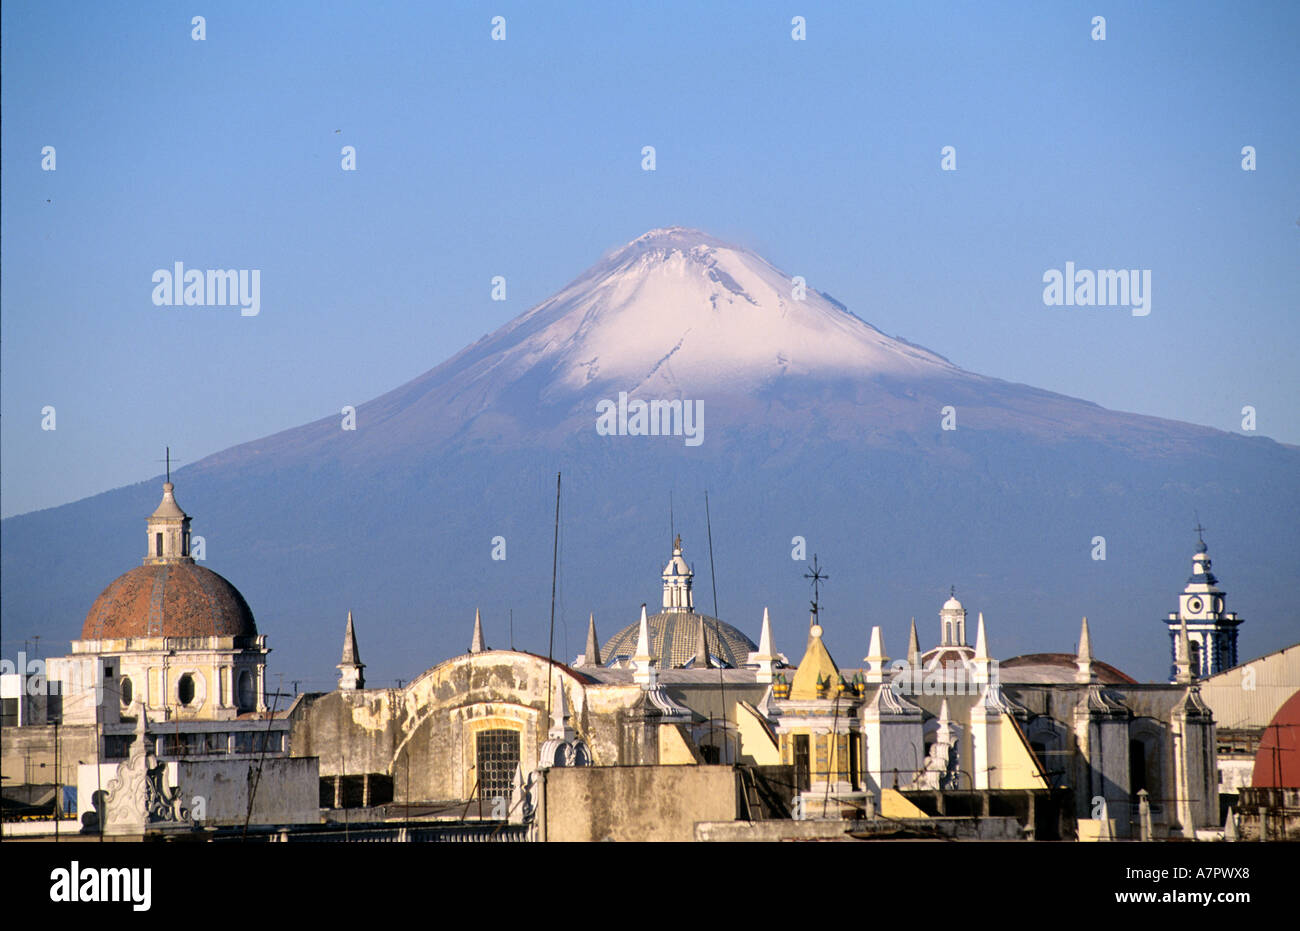 Mexico, Puebla State, Popocatepelt volcano above the Puebla city - Stock Image